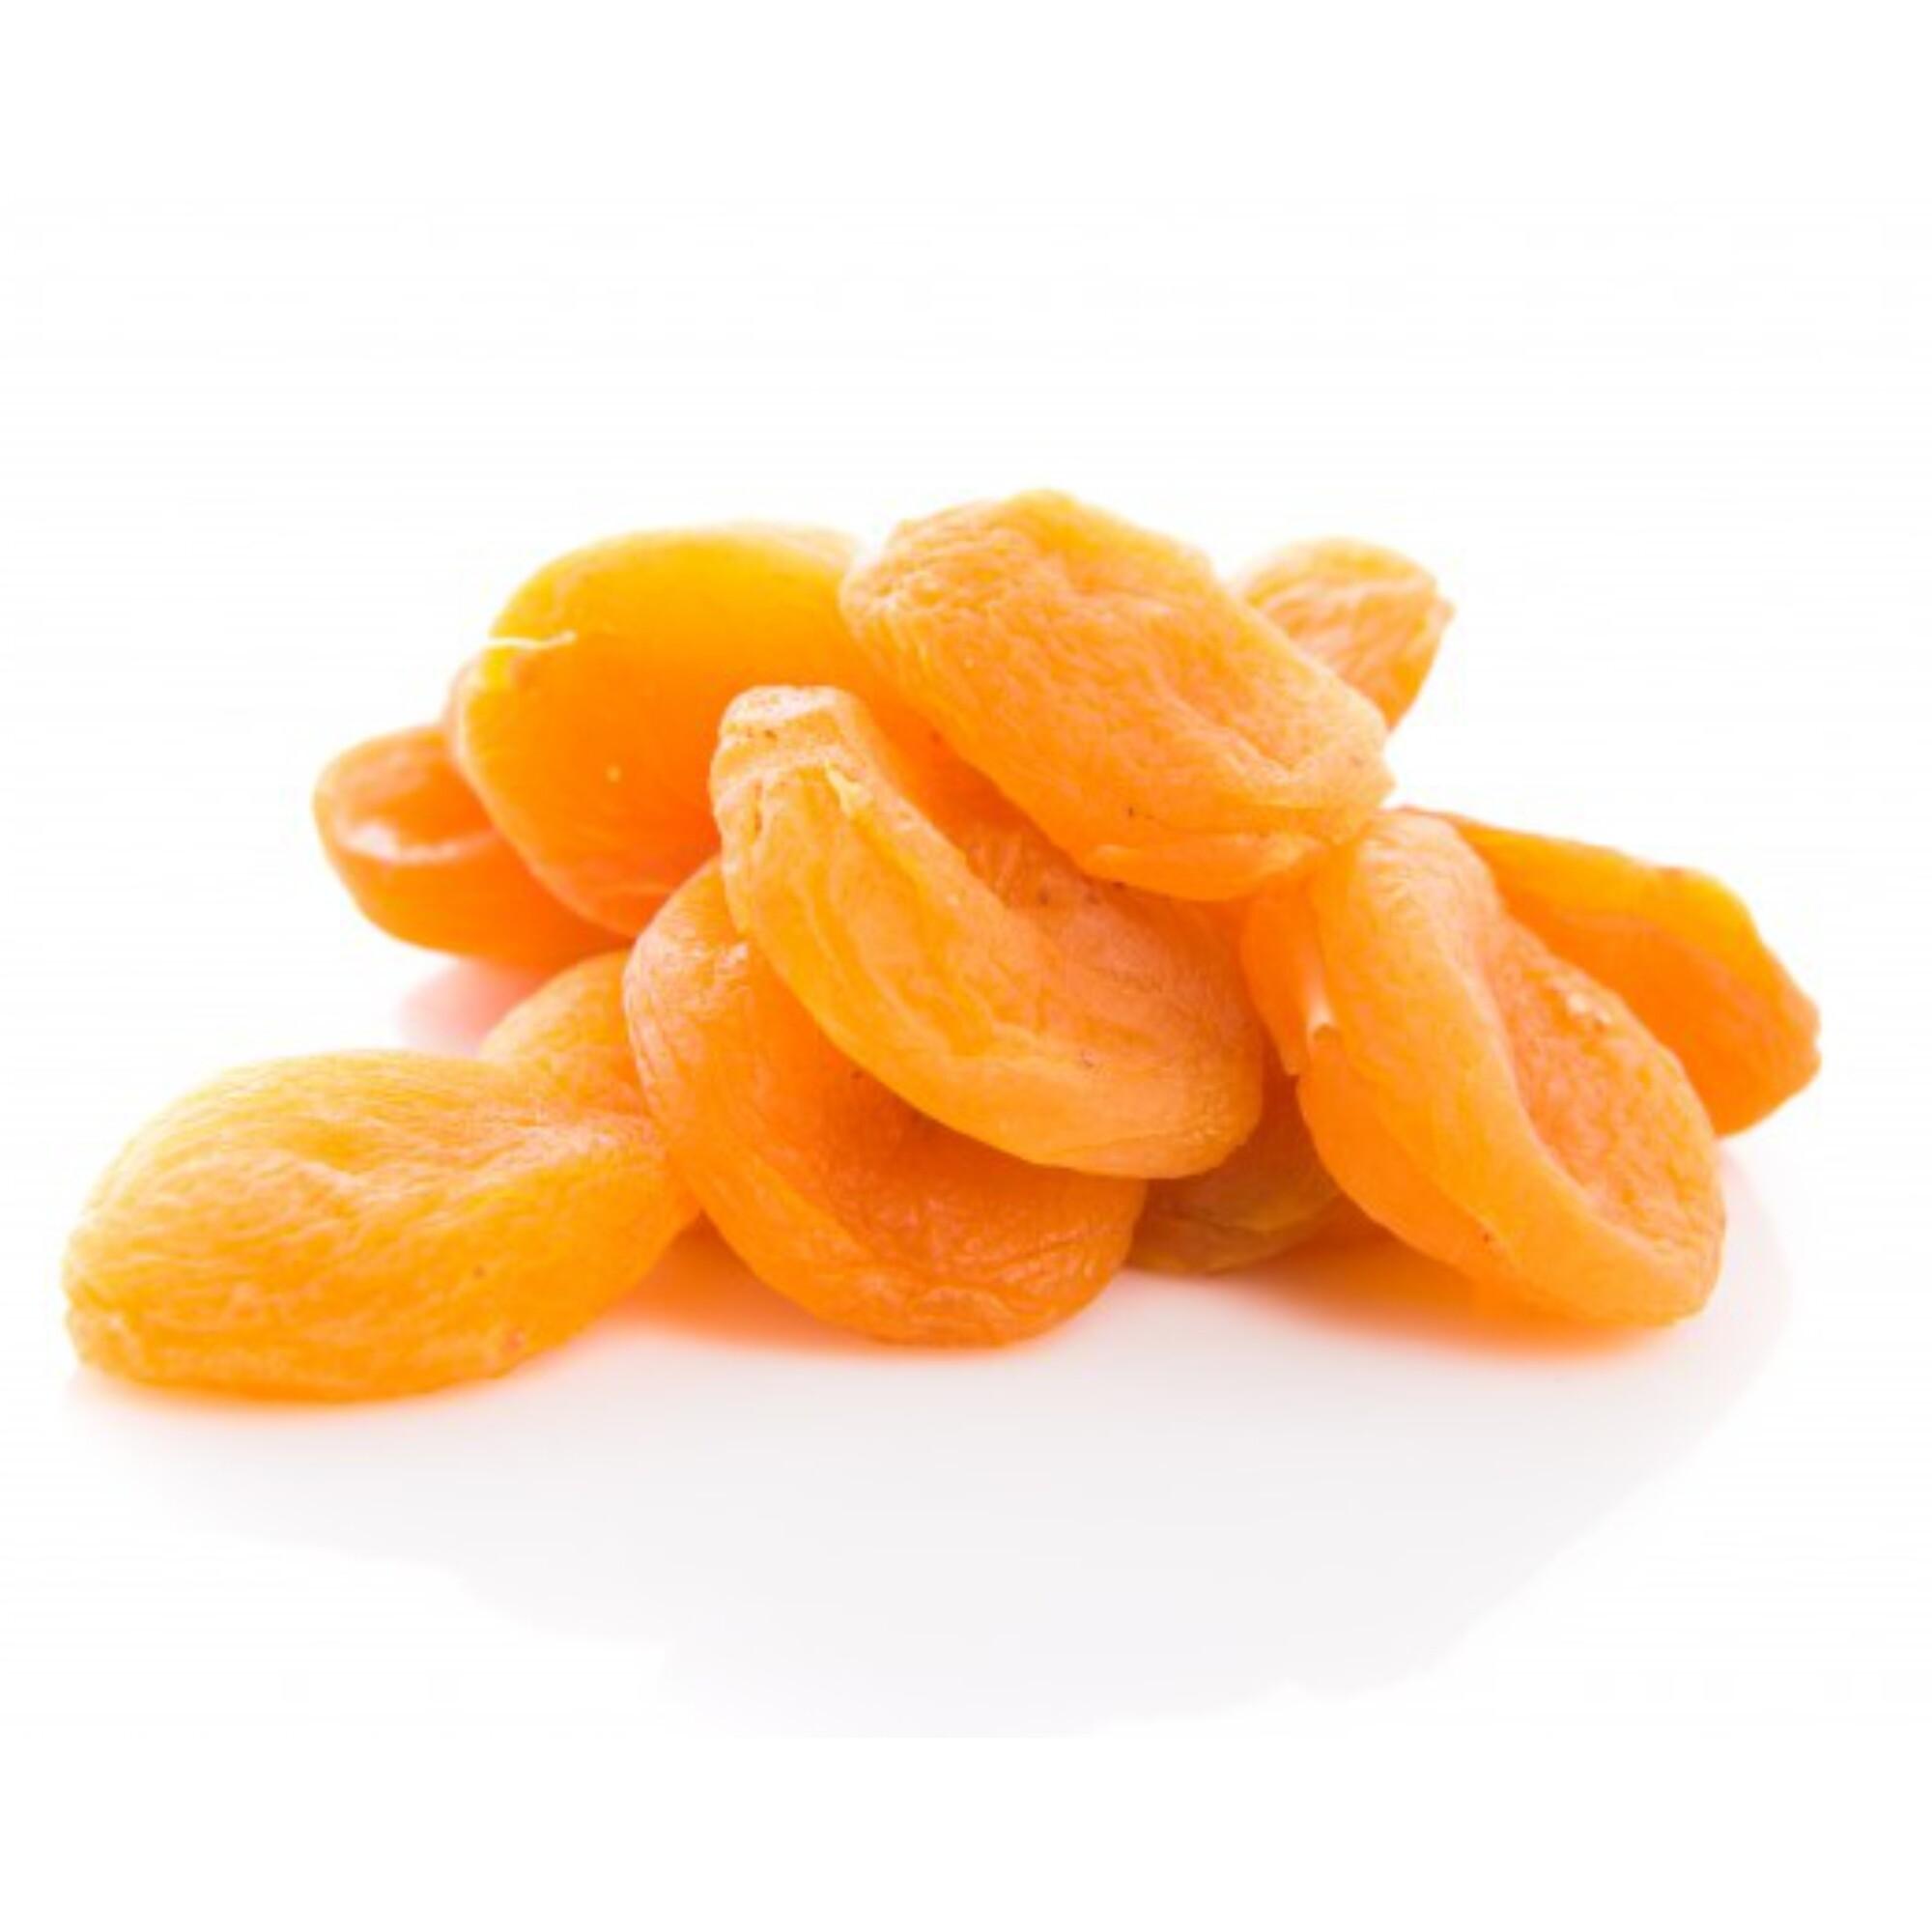 (1kg) Acetreme Dried Apricot- dried fruit